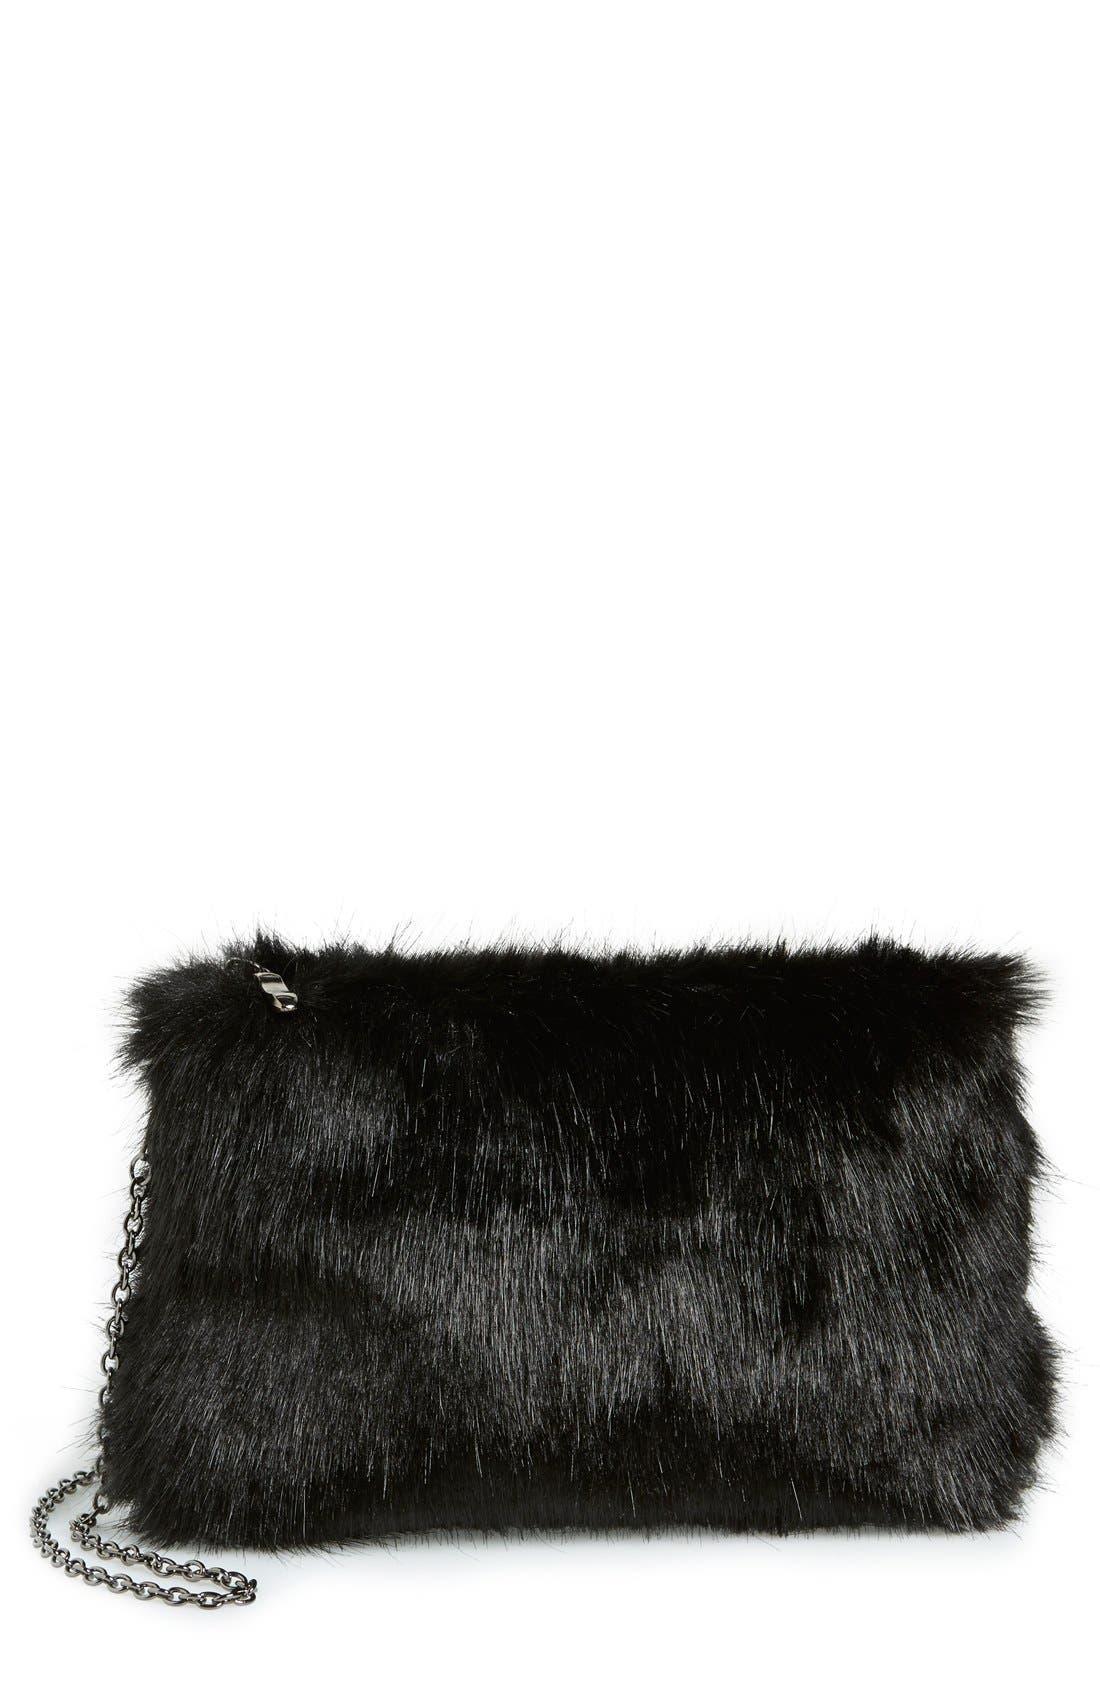 LA DOUBLE 7,                             No Brand Needed Faux Fur Convertible Clutch,                             Main thumbnail 1, color,                             001